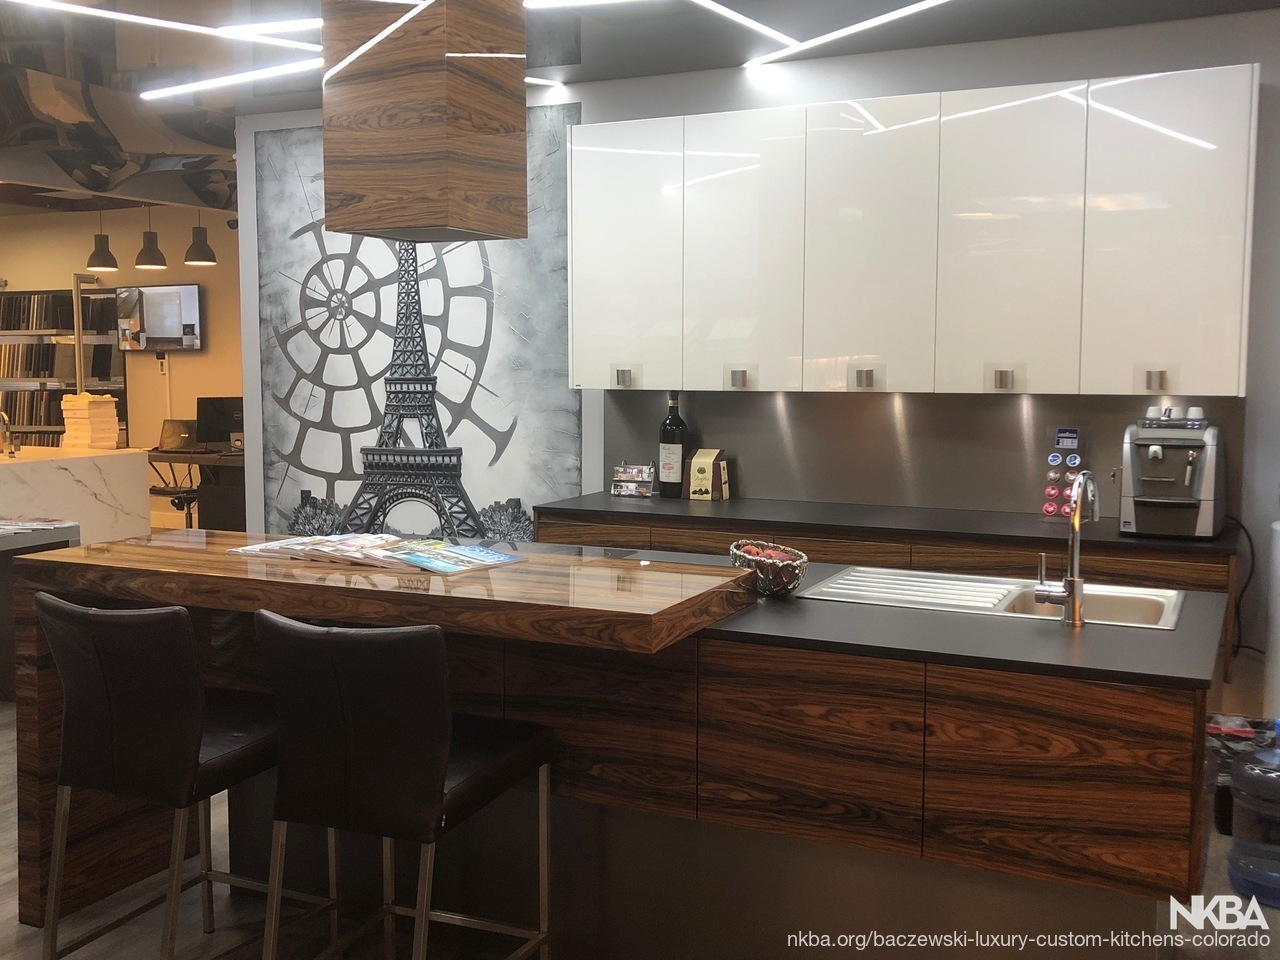 COntemporary Kitchens Denver Colorado - NKBA